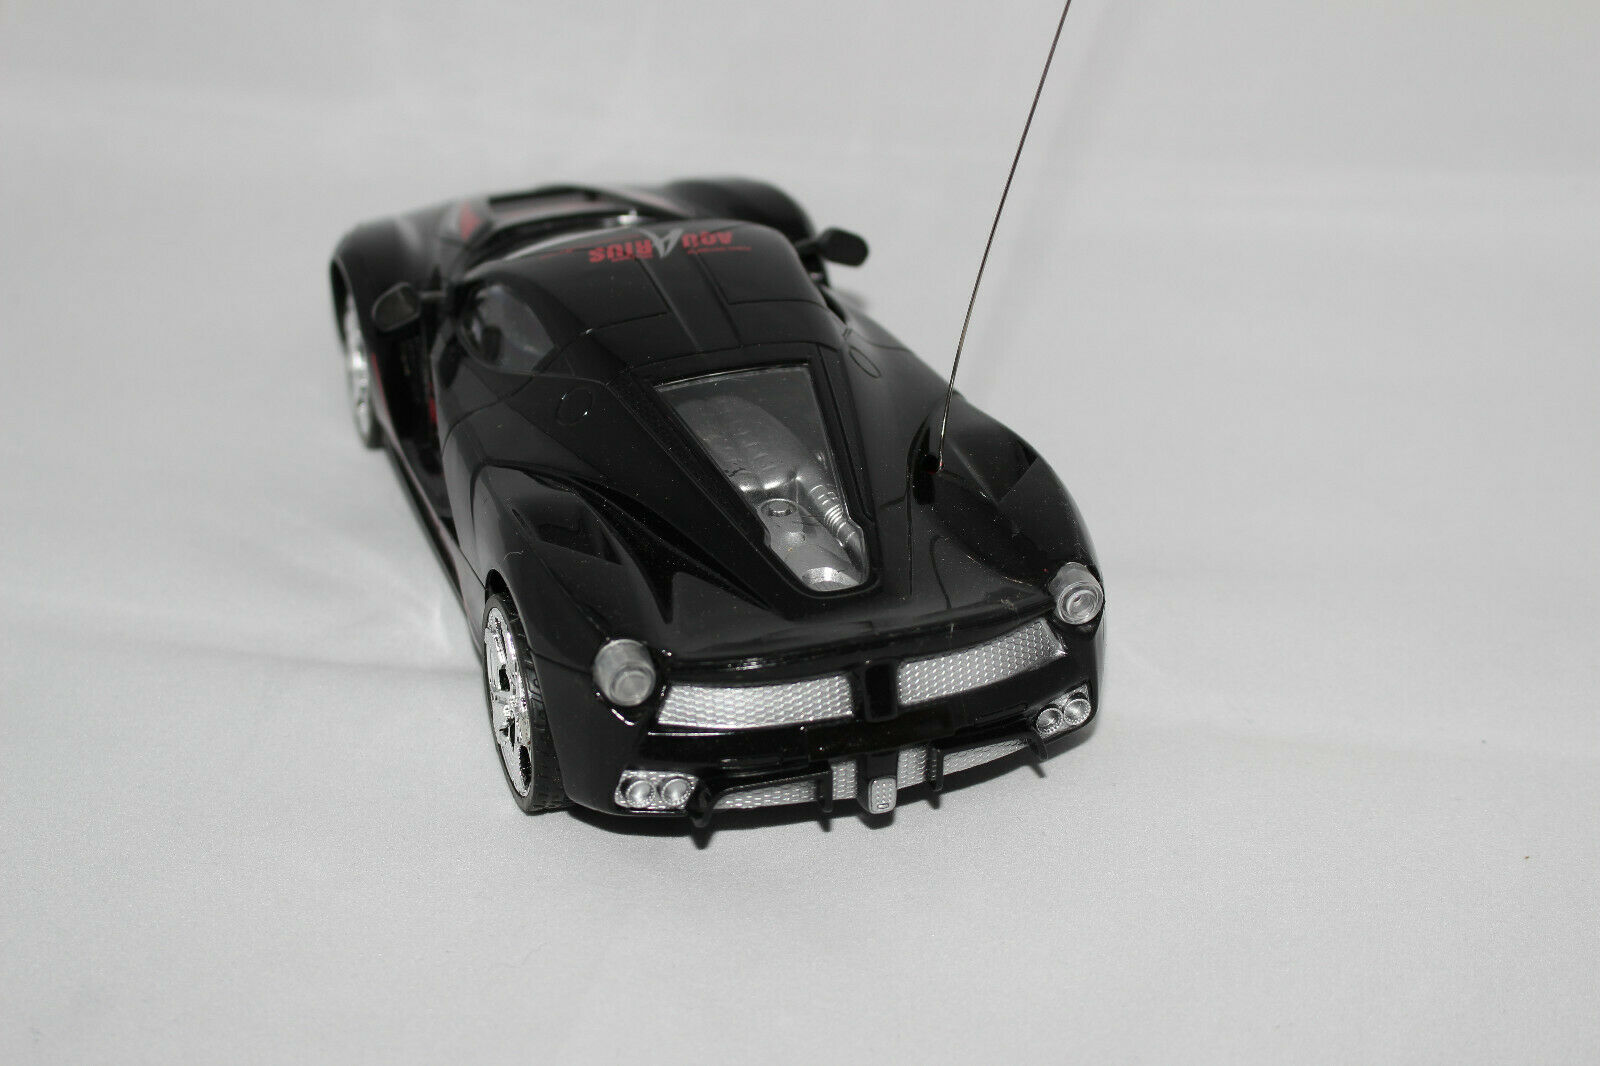 RC Mini Helikopter Revell und RC Auto Auto Auto 1 18 neu Paket 24ff88